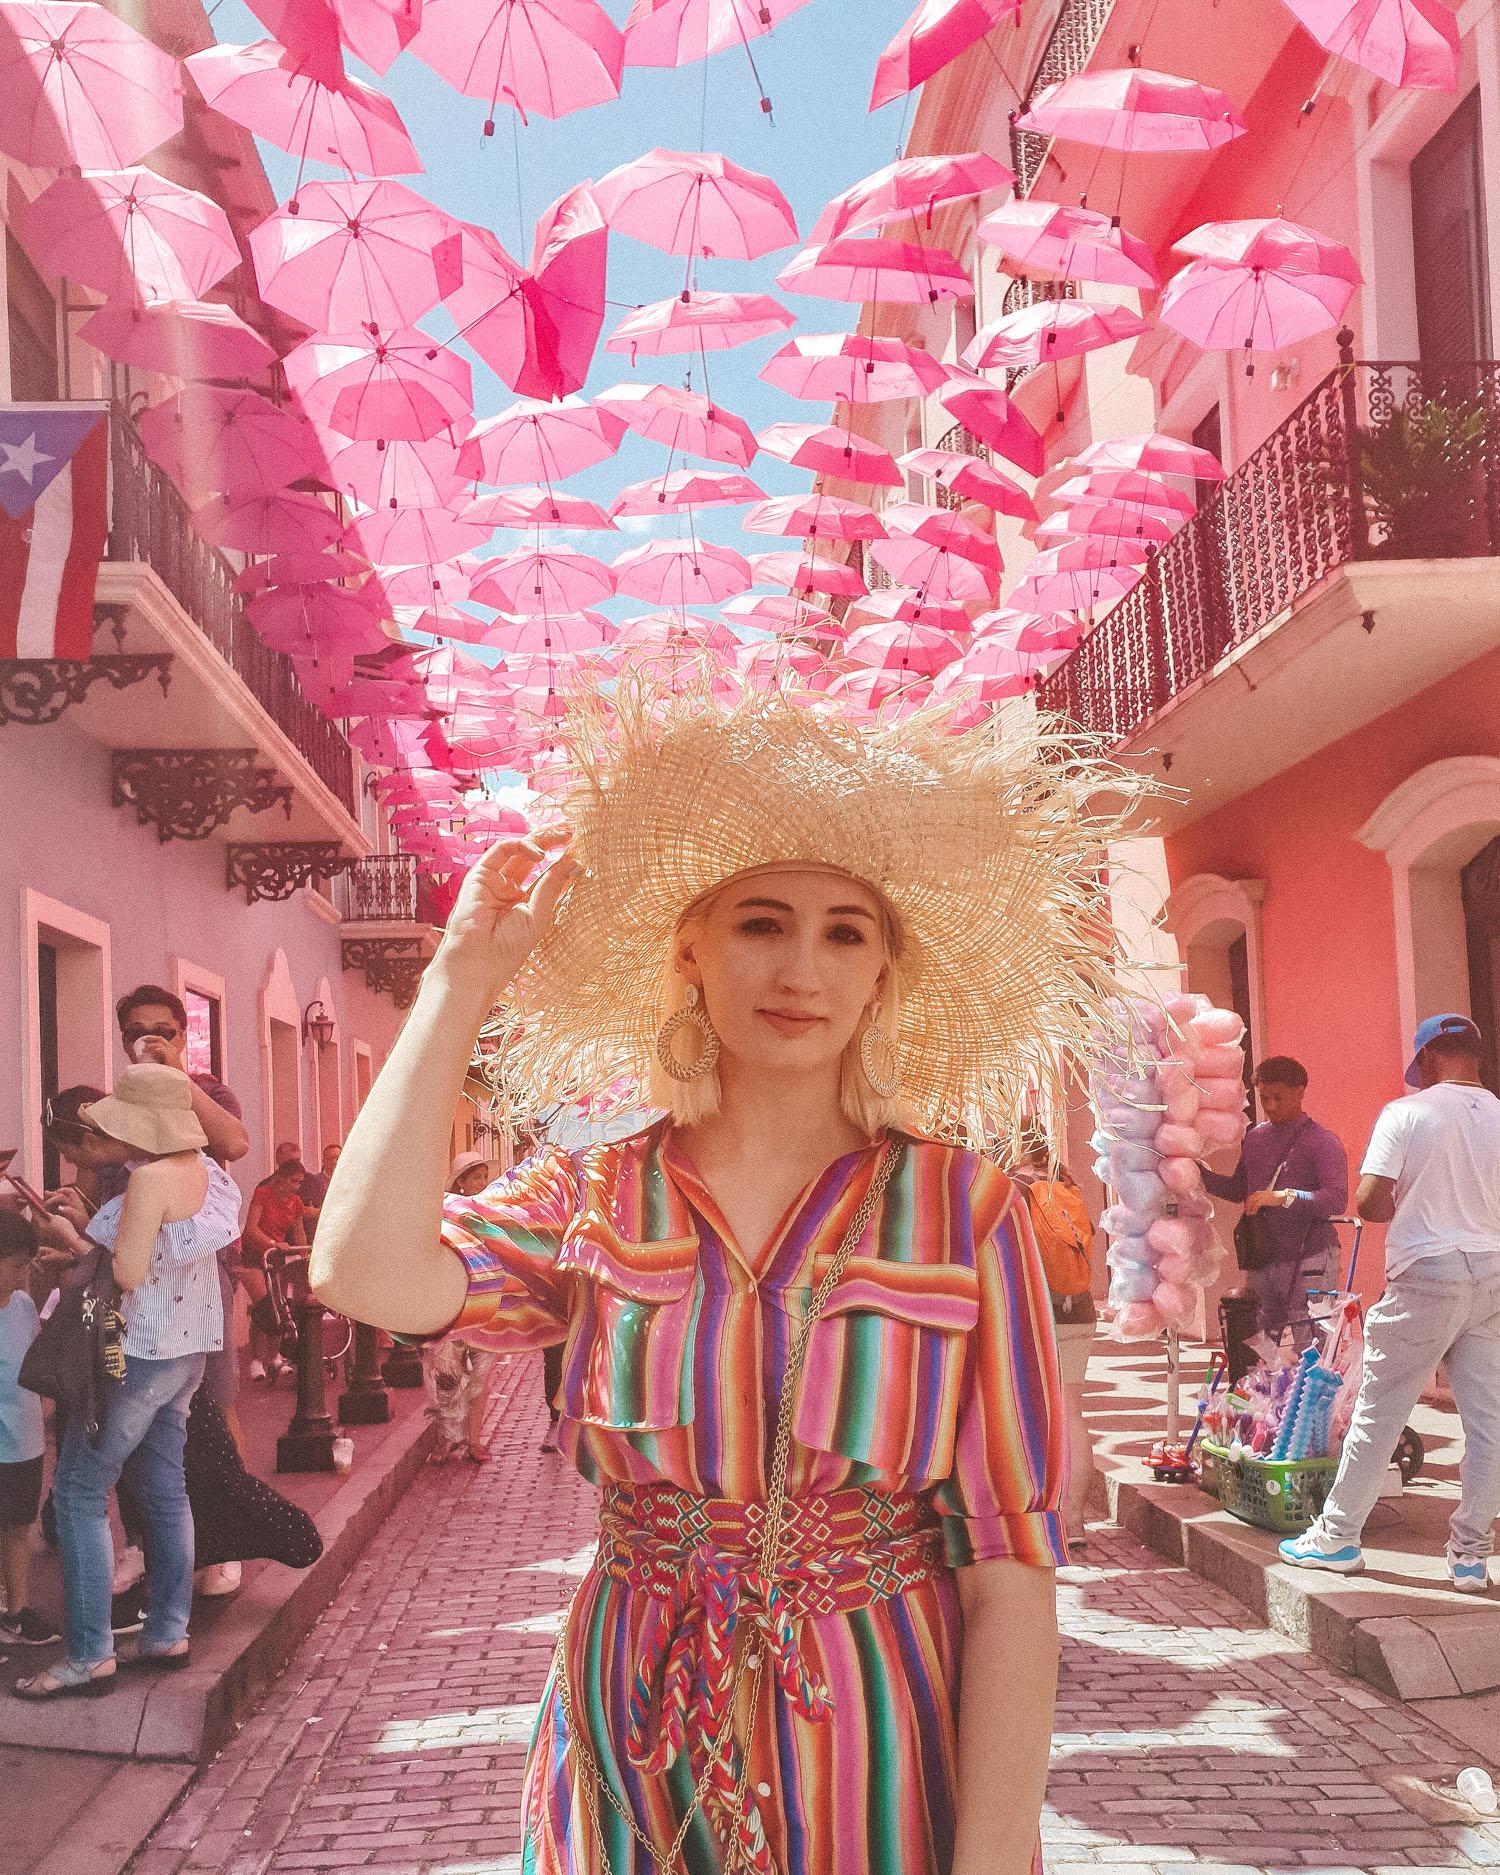 Travel Blogger wearing All Things Mochi rainbow dress under umbrella street San Juan, Puerto Rico